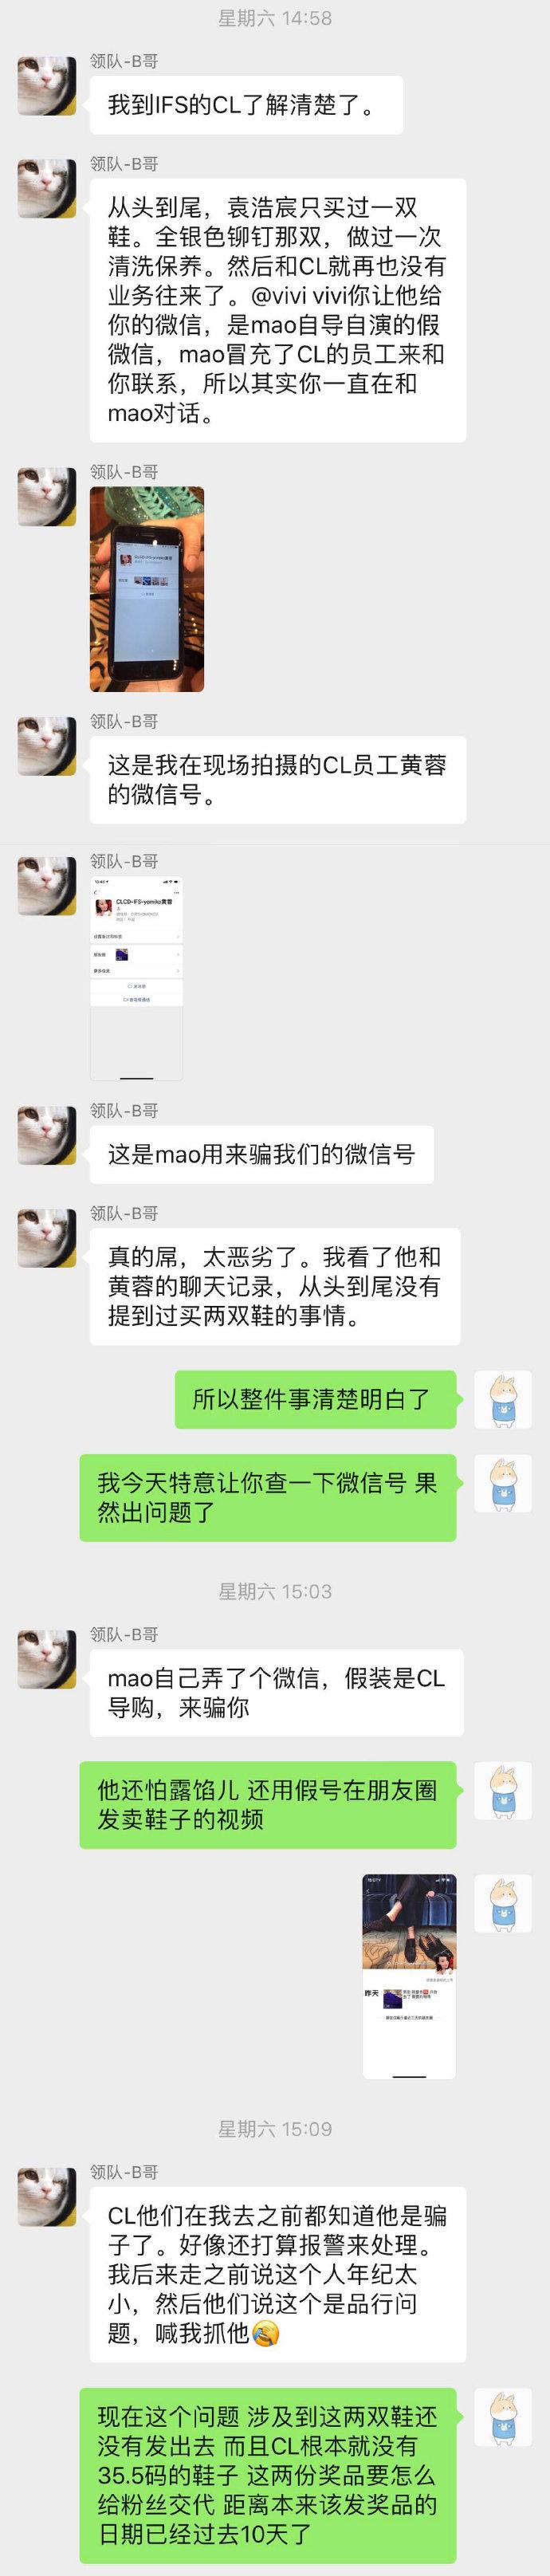 CL战队发文:前战队经理Mao玩忽职守、挪用公款